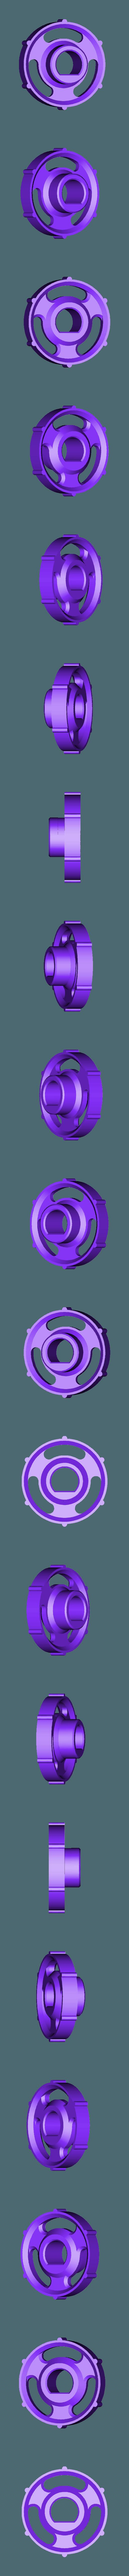 Spur_Hub.stl Download free STL file OpenRC F1 Dual Material Spur & Pinion Gears • 3D printing model, Greg_The_Maker